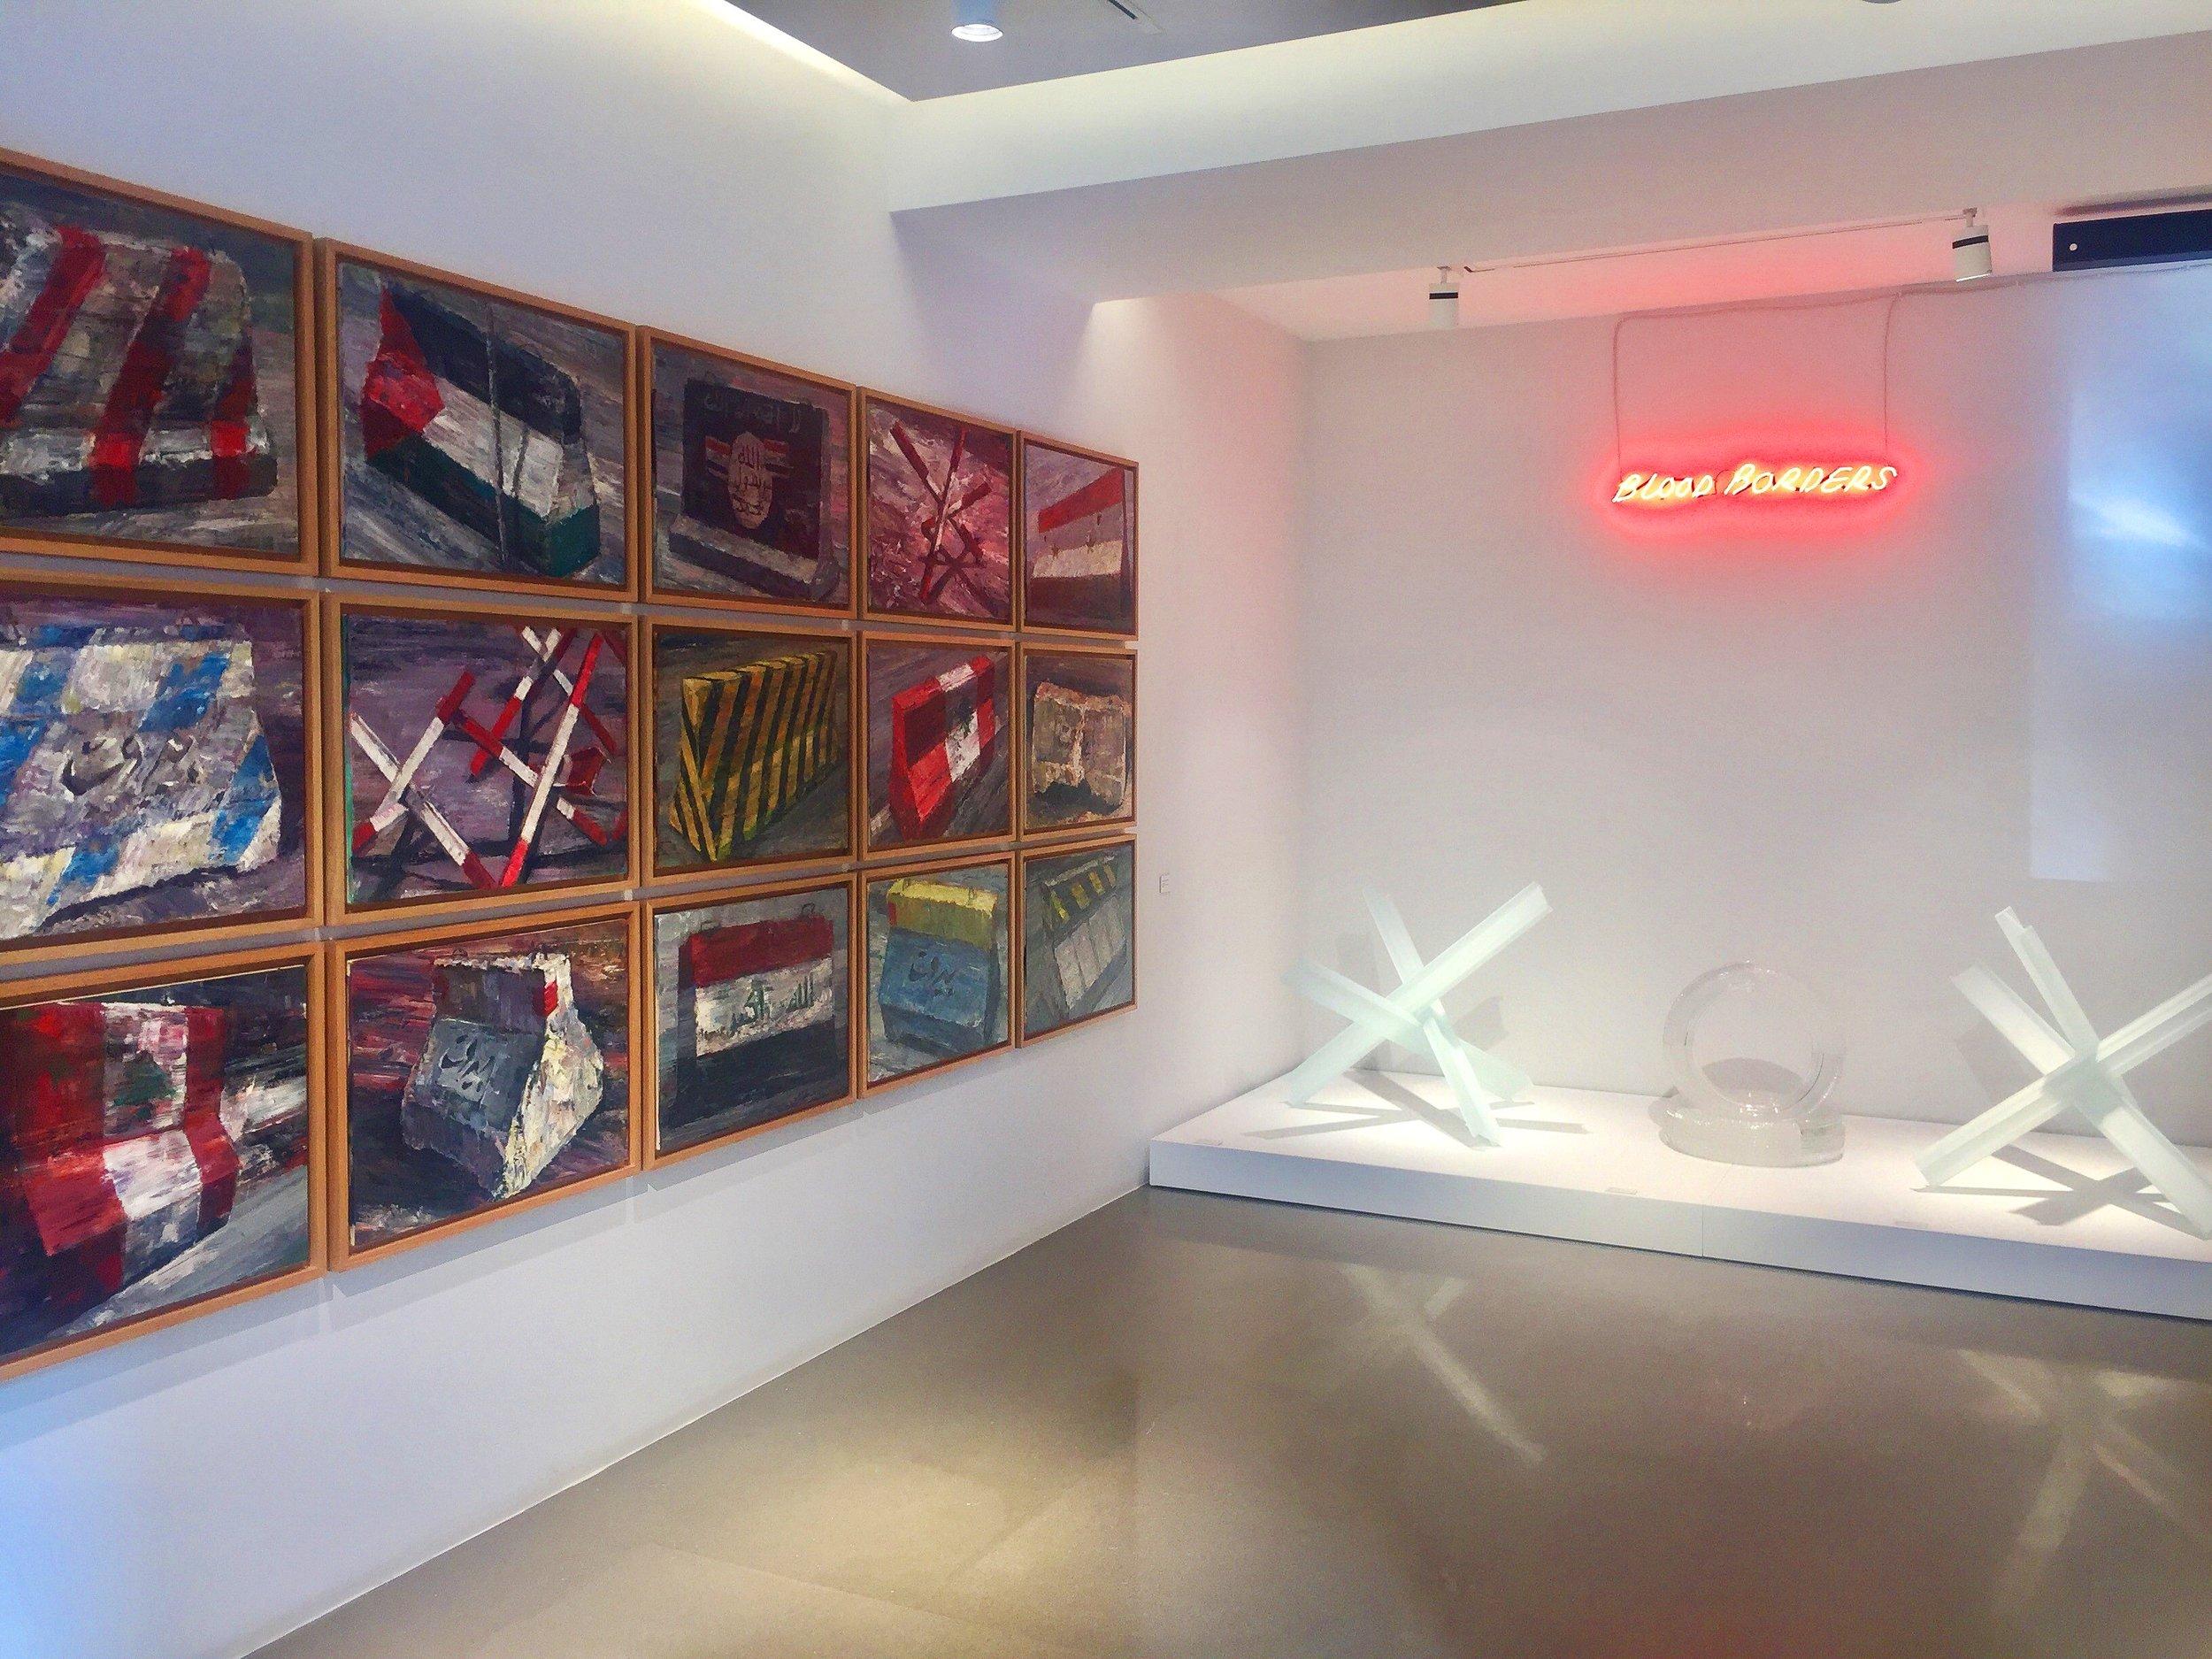 Ayman Baalbaki's solo show at Saleh Barakat Gallery